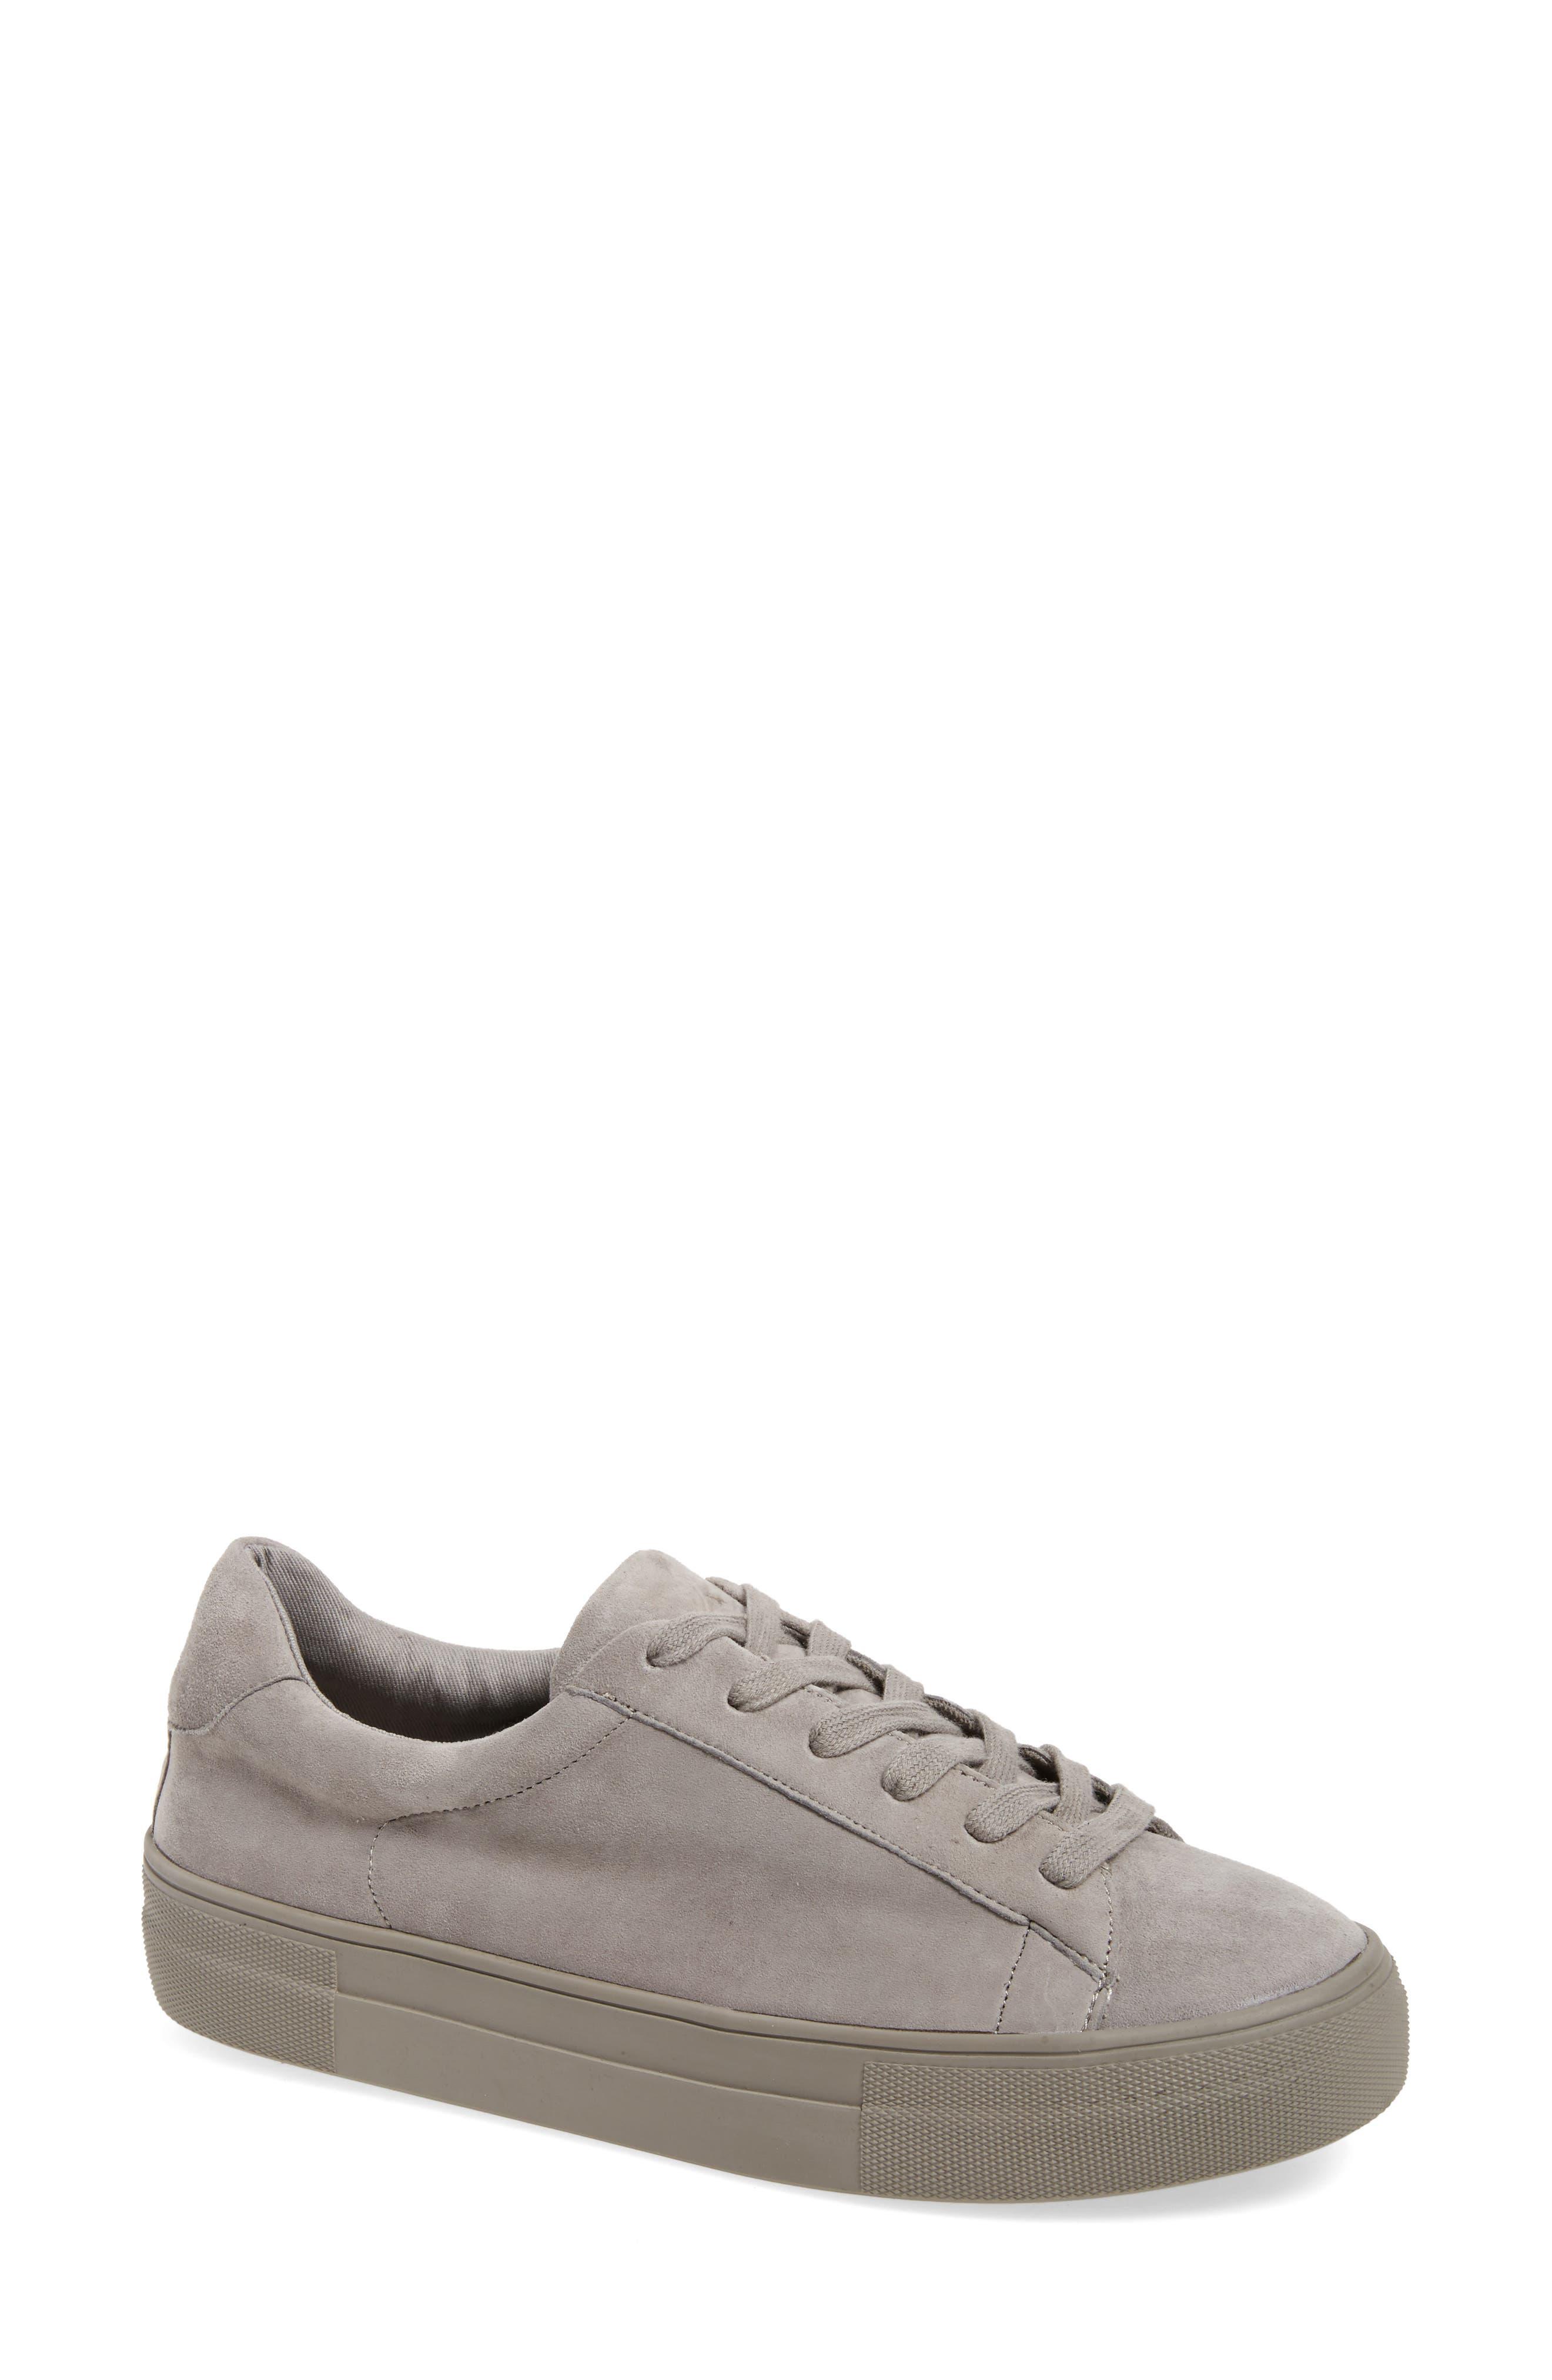 Gisela Low Top Sneaker,                         Main,                         color, 020